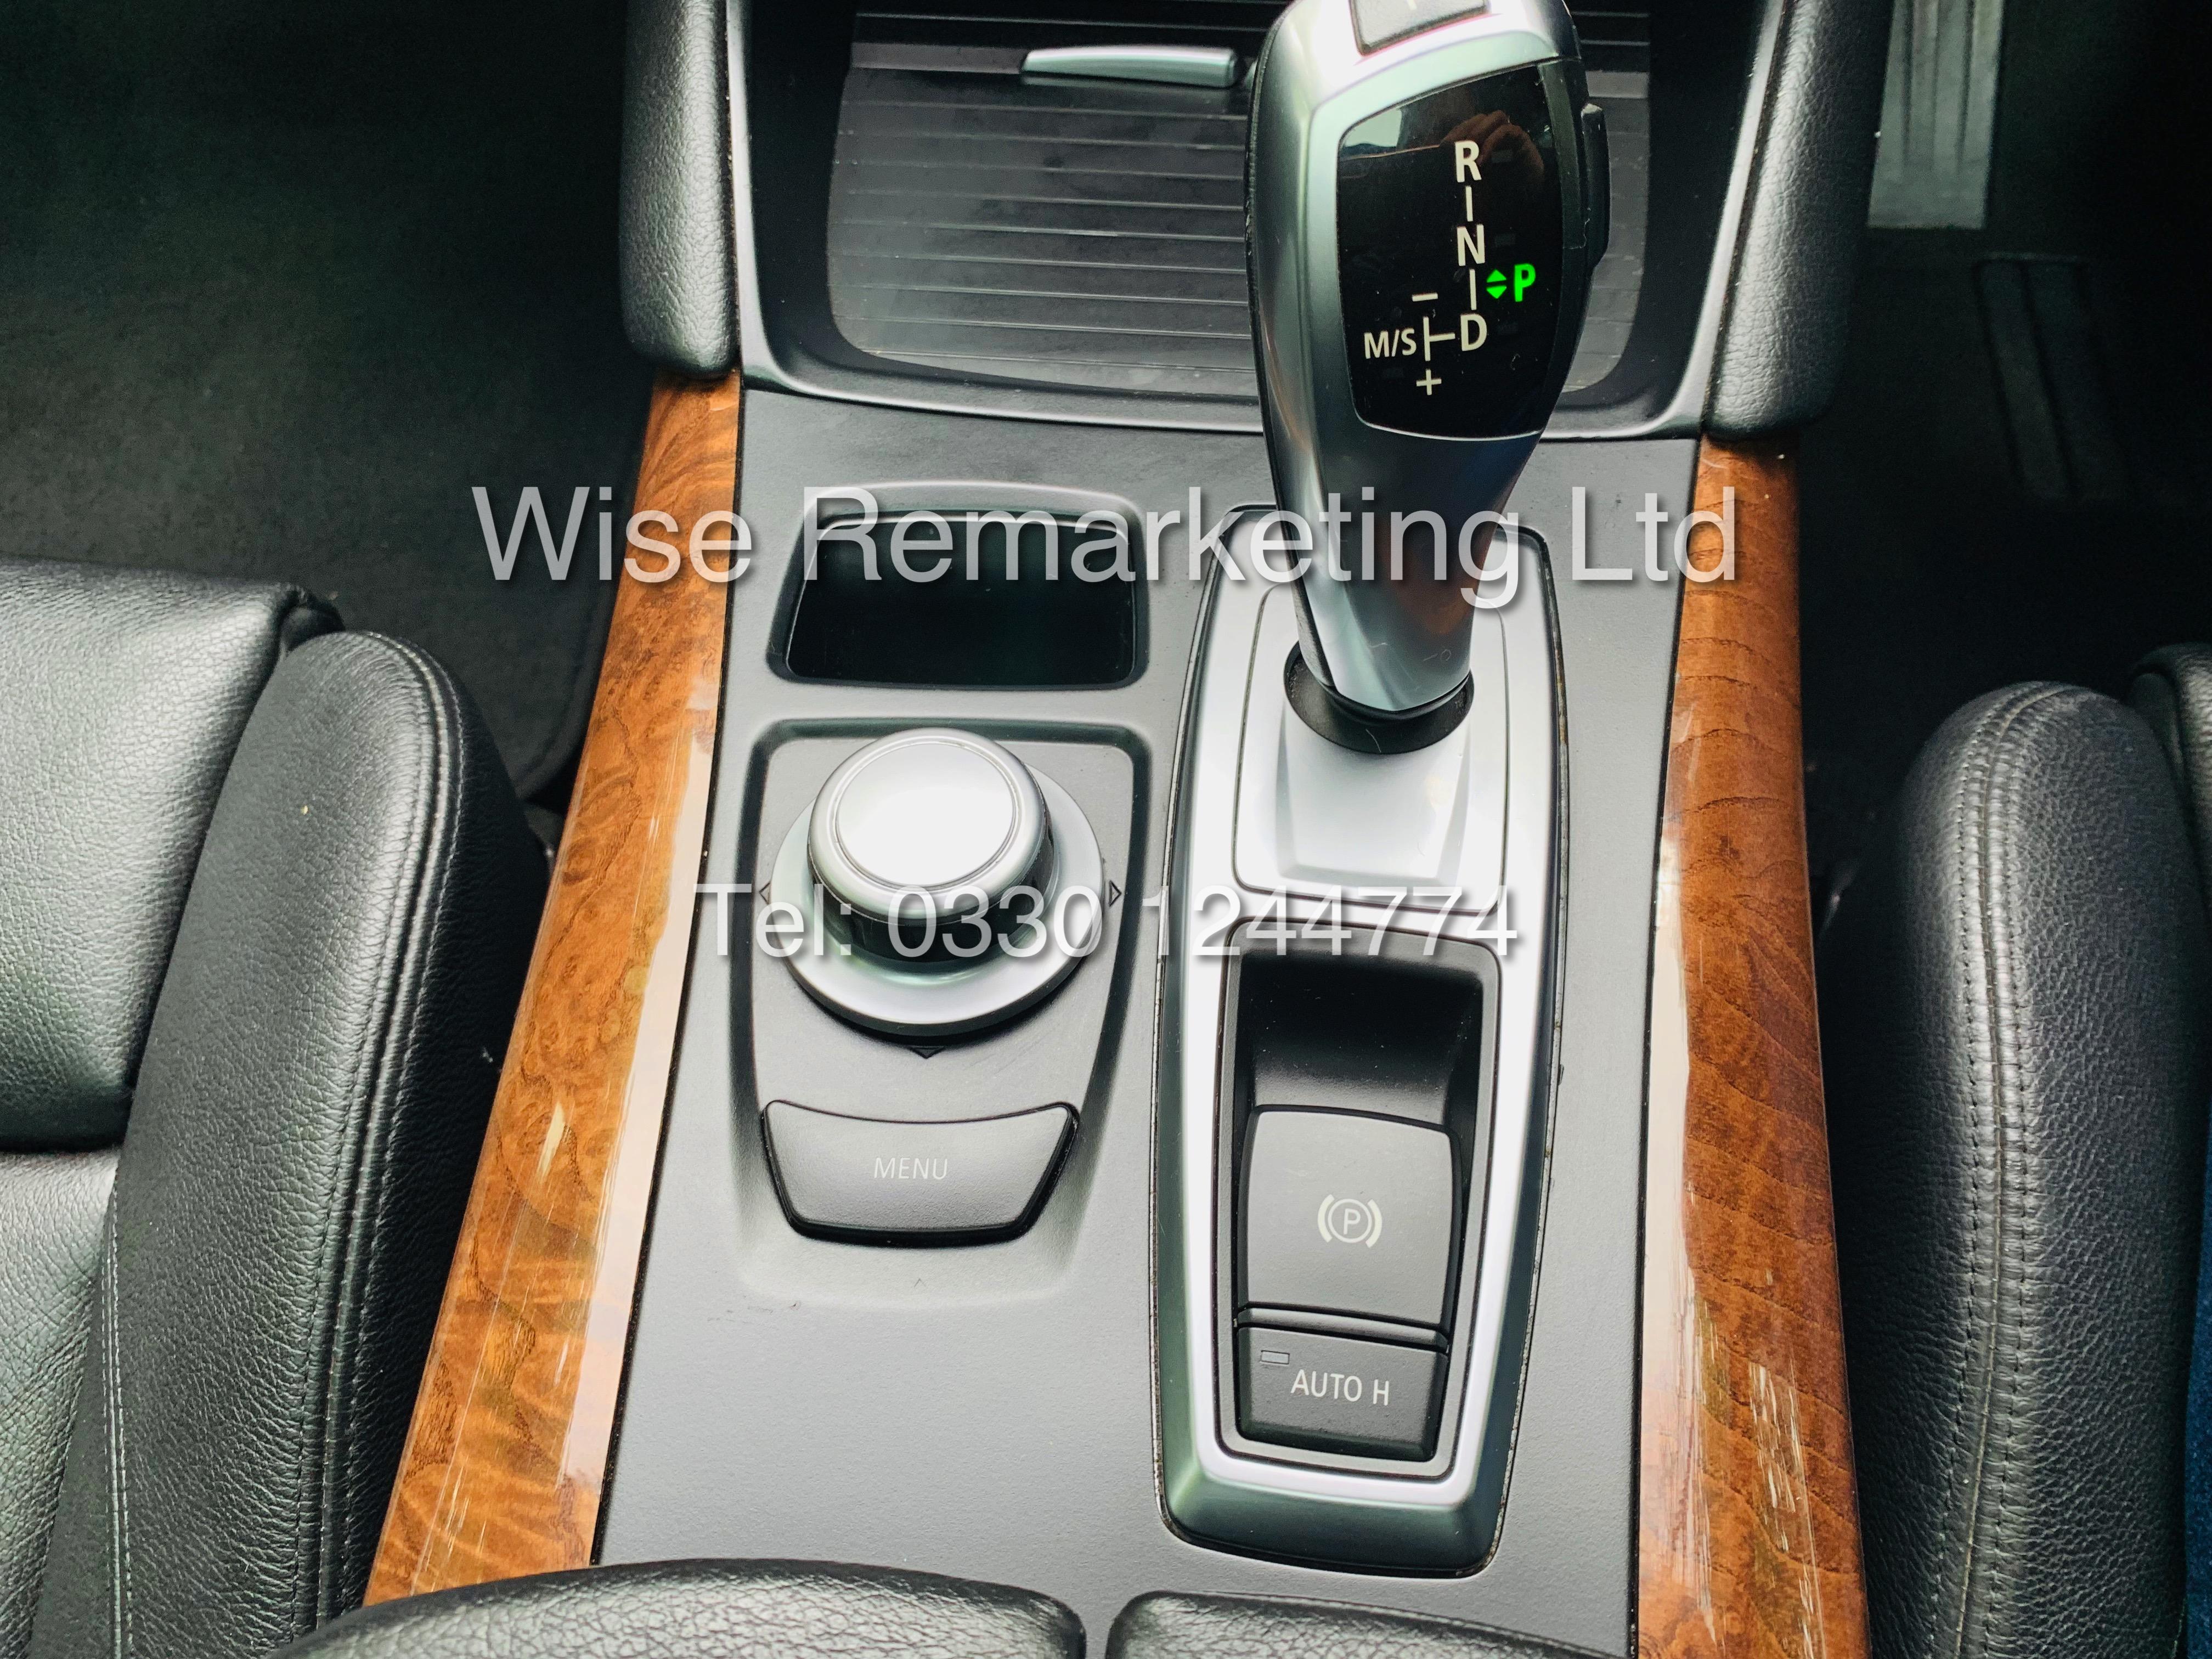 BMW X6 XDRIVE 35D AUTO (2009 SPEC) *1 PREVIOUS OWNER* PARKING AID - SAT NAV - FSH - Image 22 of 25